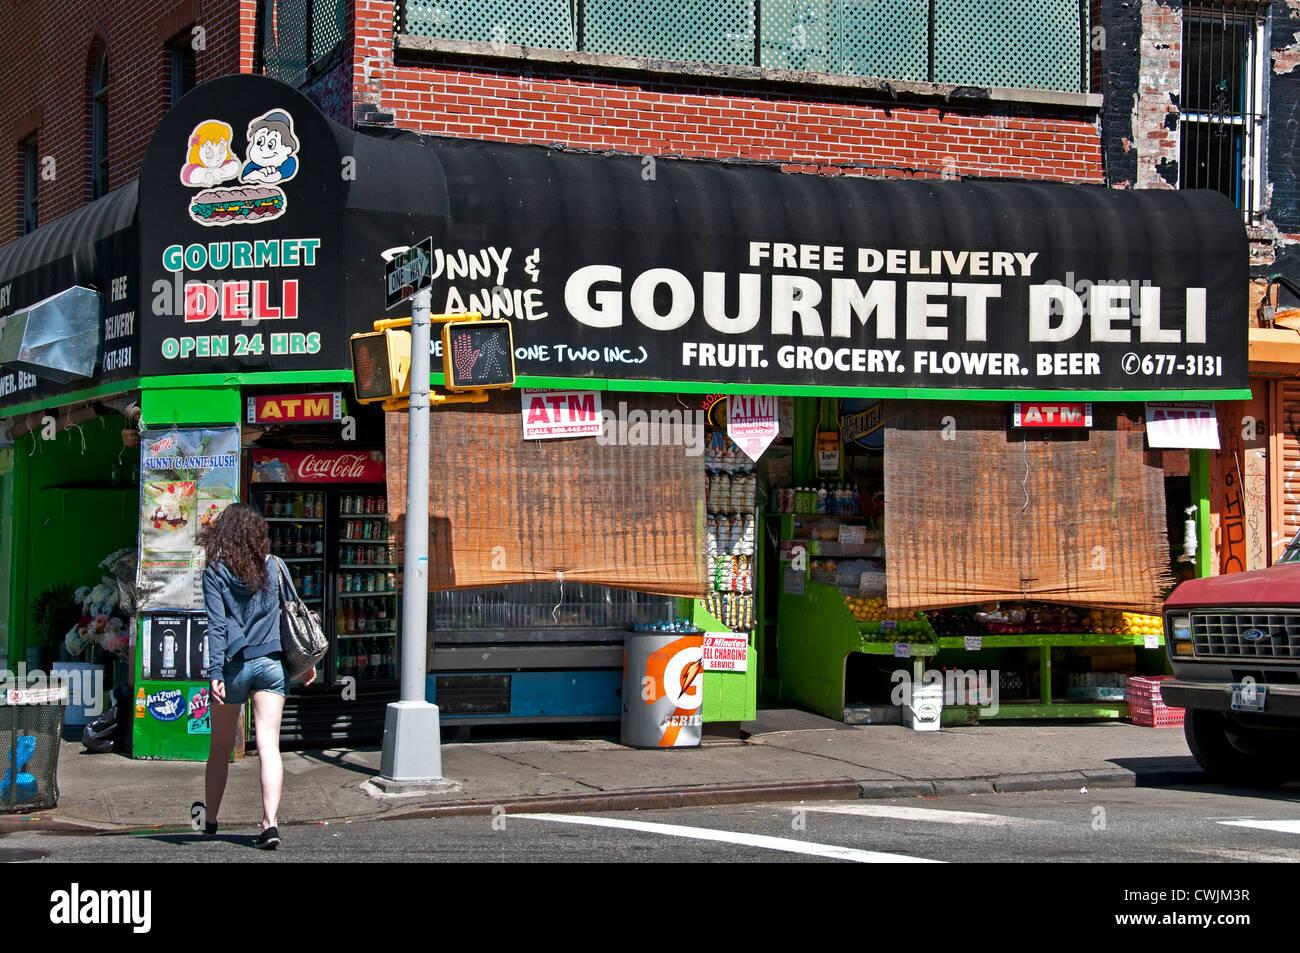 New York City Village Gourmet Deli Fruit grocery Flower Beer - Stock Image